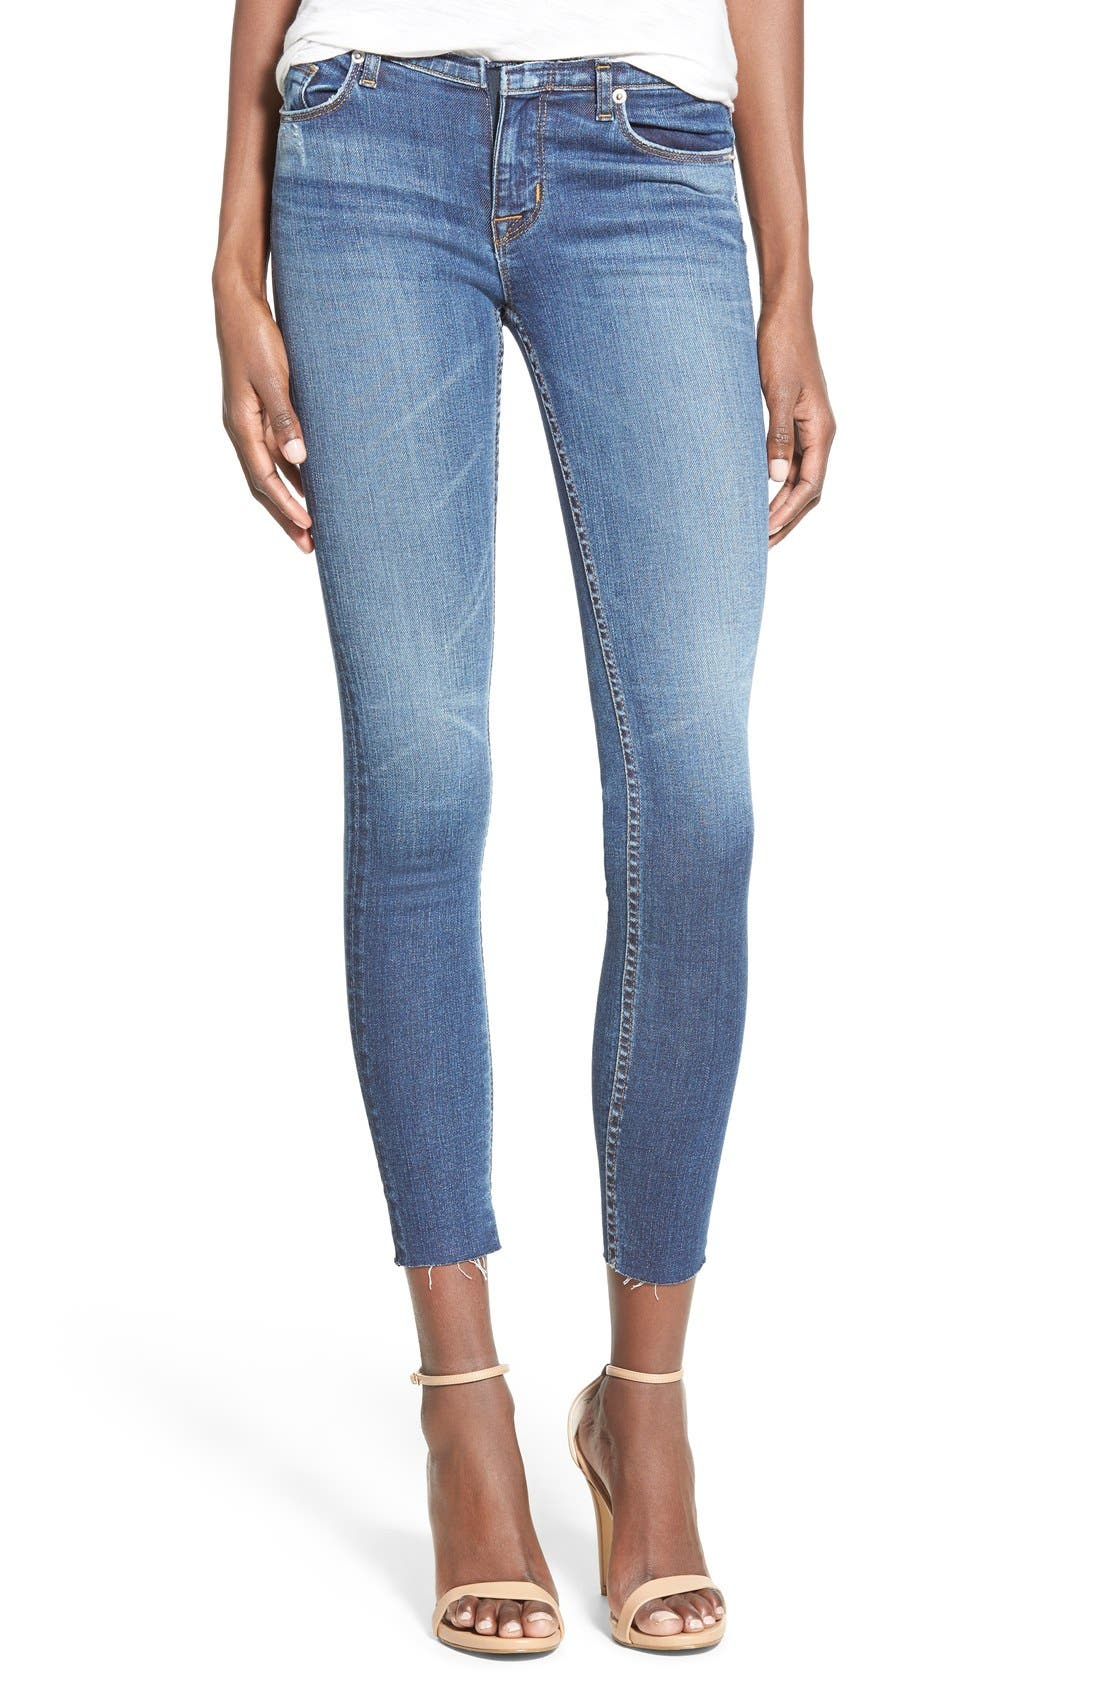 Main Image - Hudson Jeans 'Krista' Raw Hem Ankle Super Skinny Jeans (Point Break)